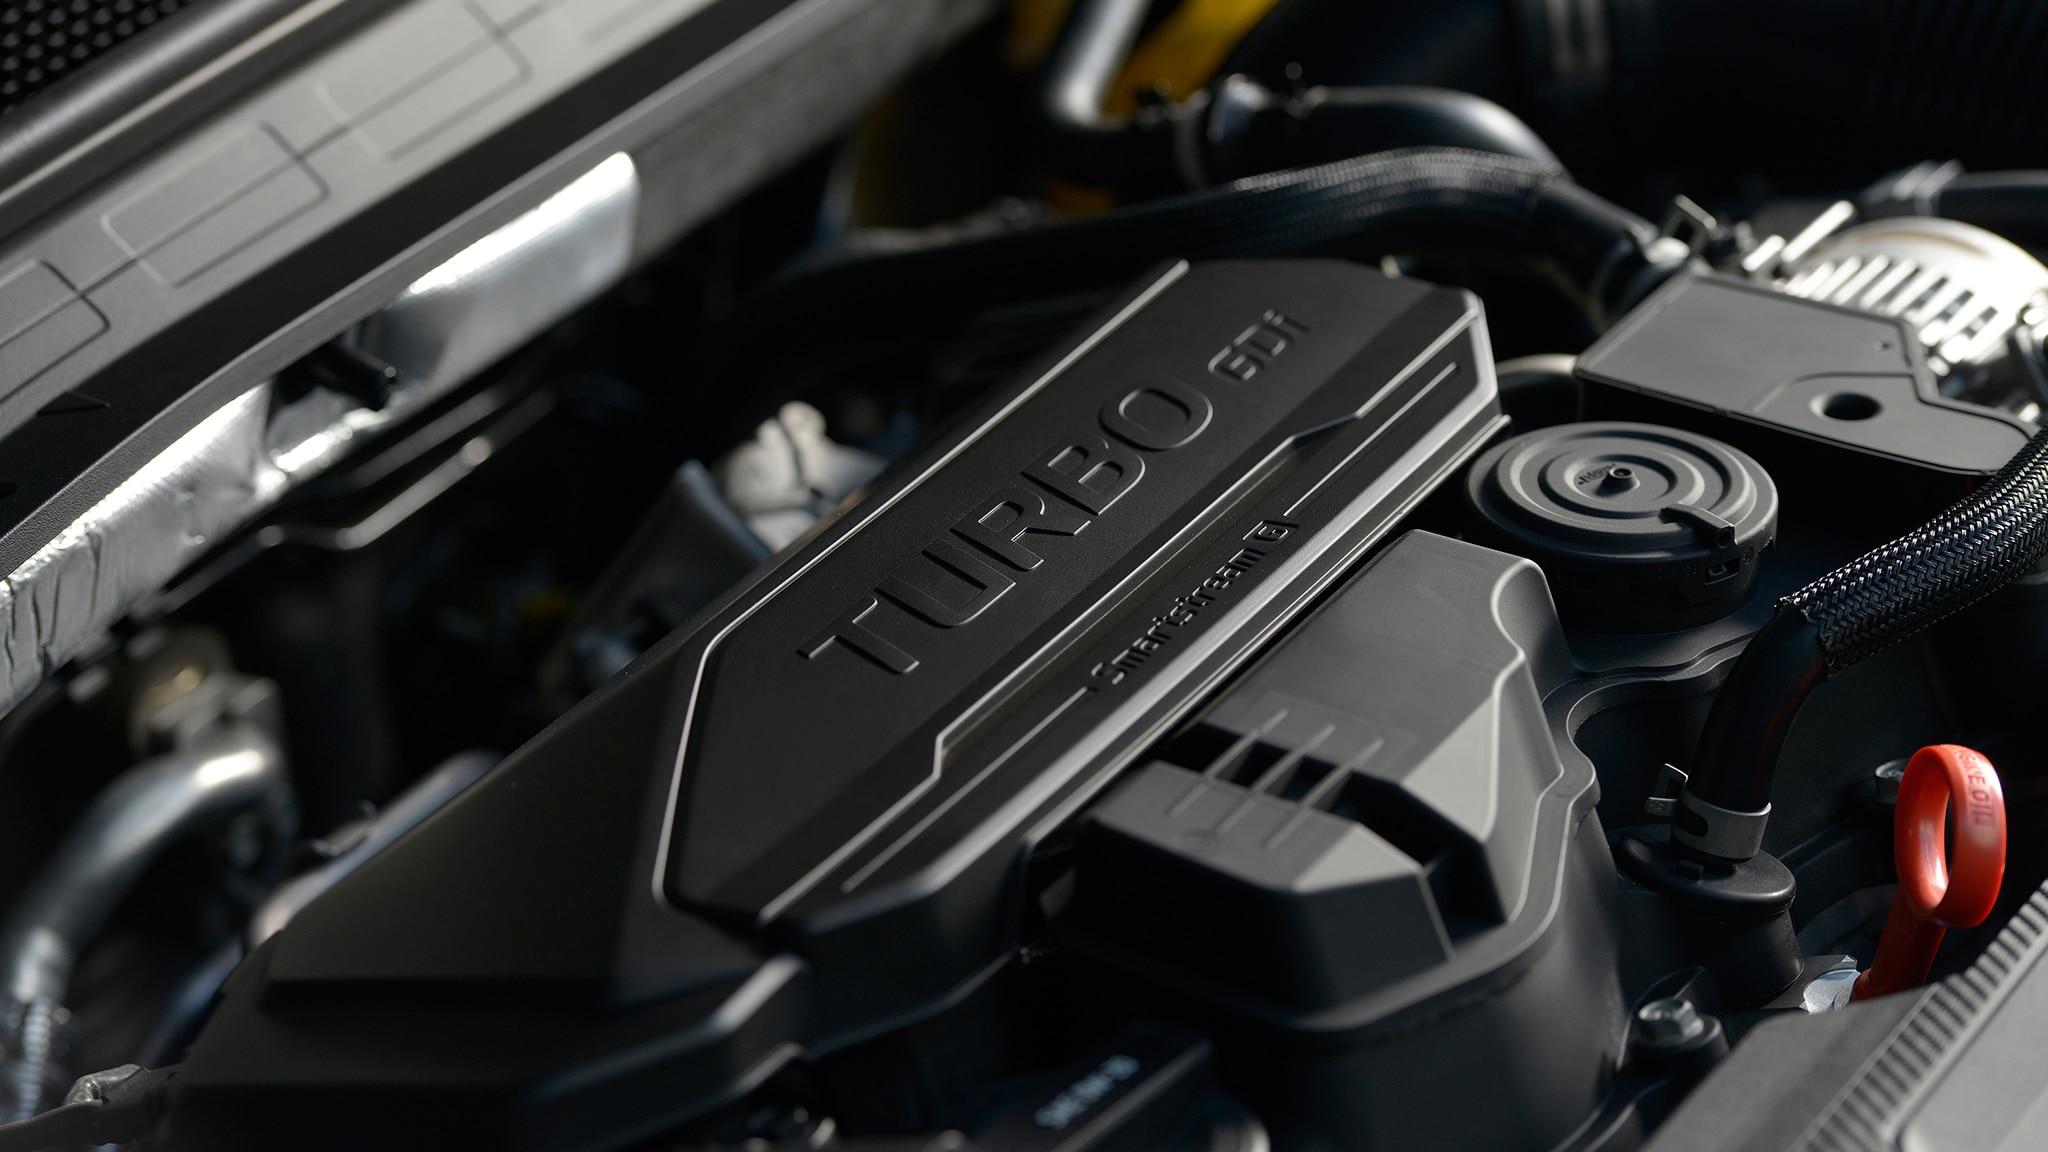 2020 Hyundai Sonata Prototype Drive: Good Manners, Fab Looks